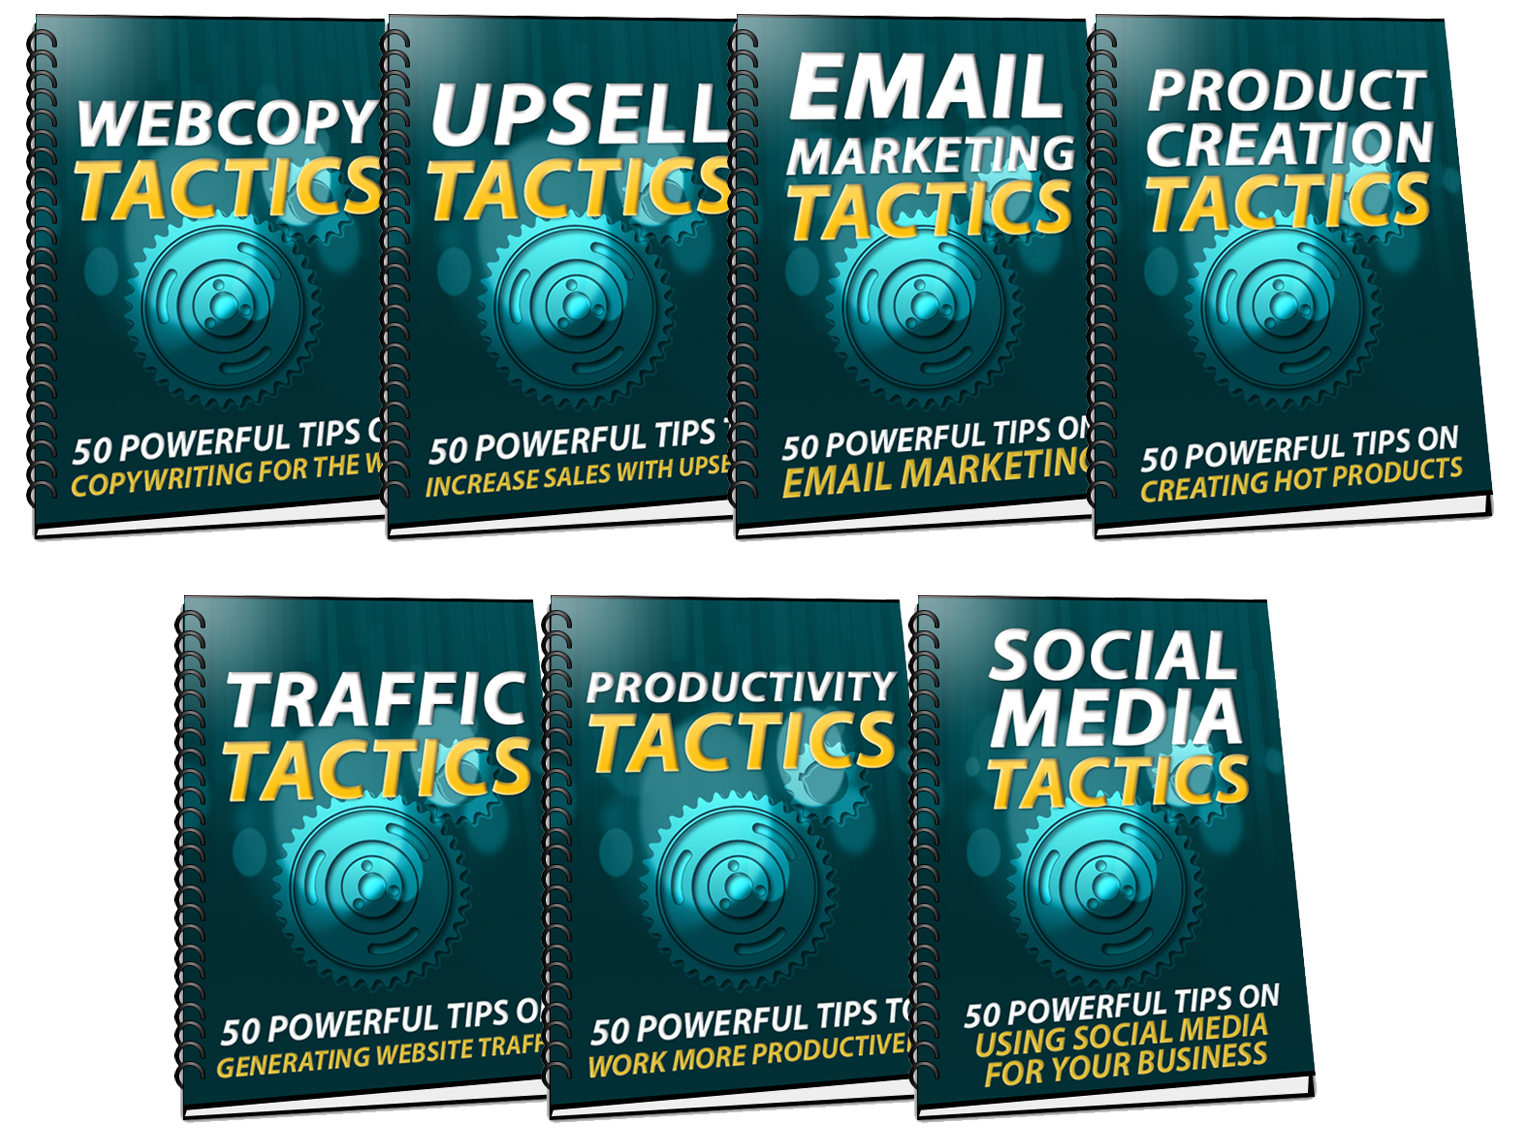 350+ Effective Marketing Tactics To Increase Sales